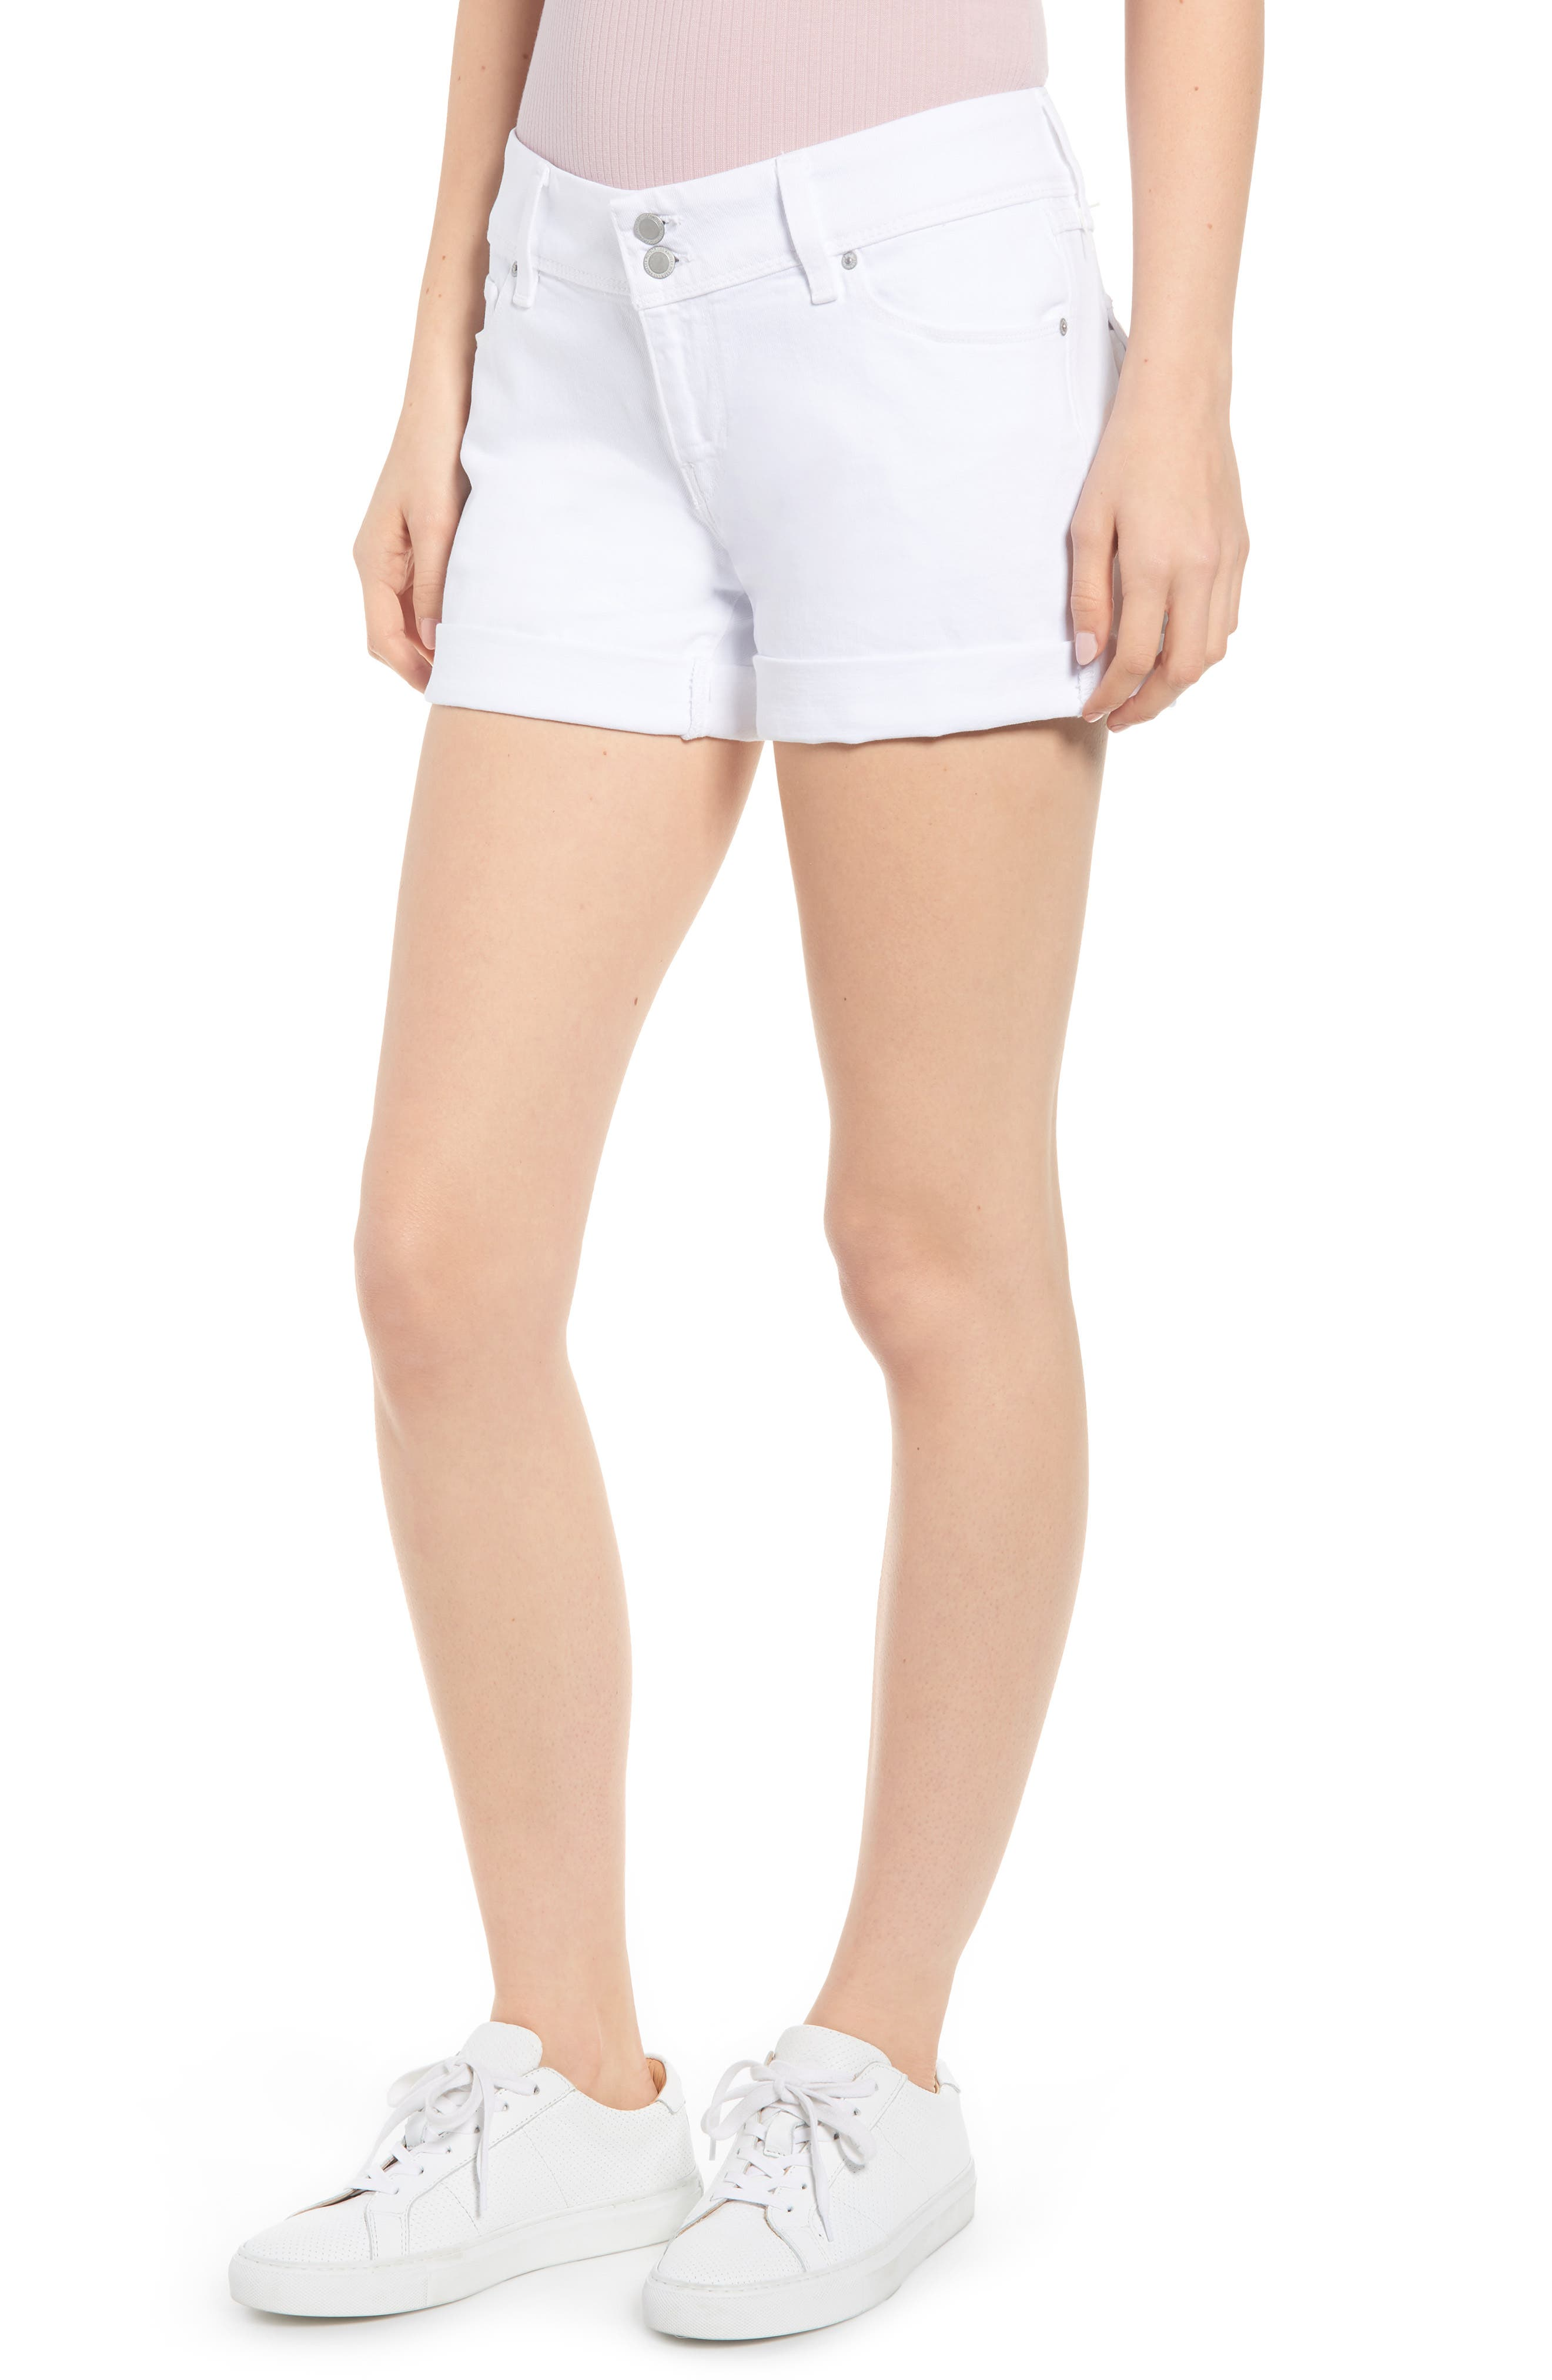 HUDSON JEANS Croxley Cuff Denim Shorts, Main, color, WHITE 2